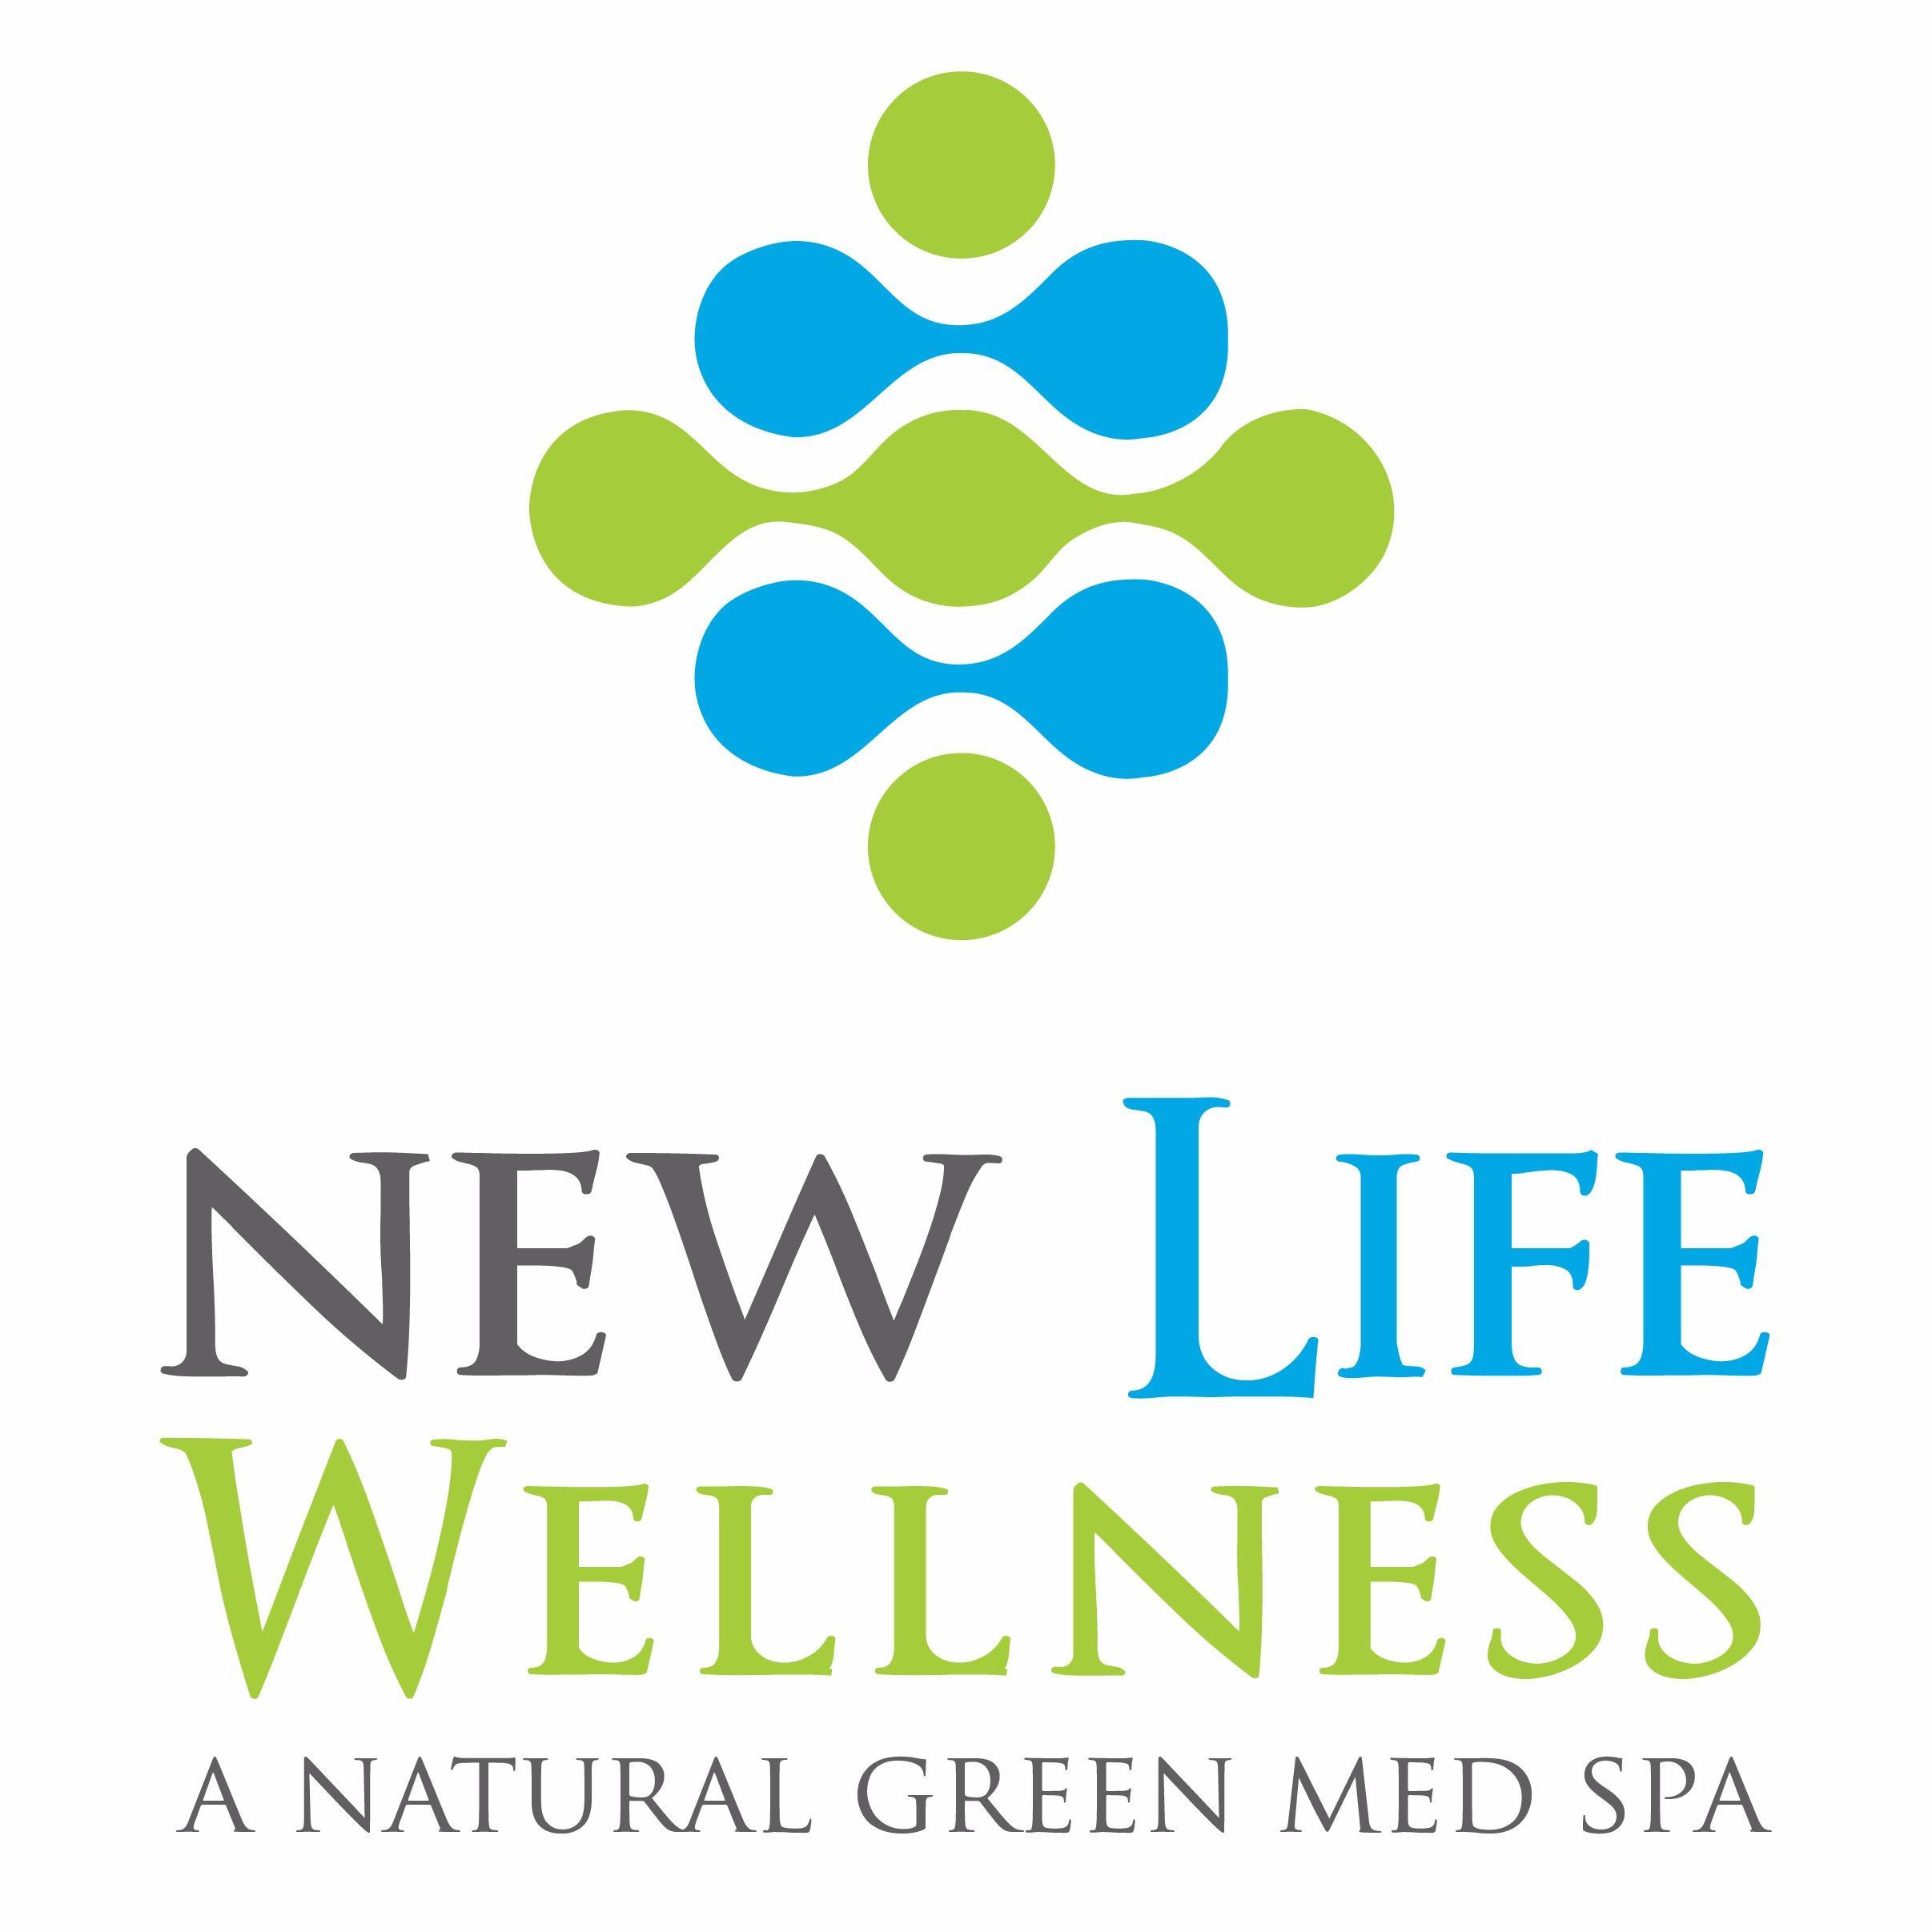 New Life Wellness